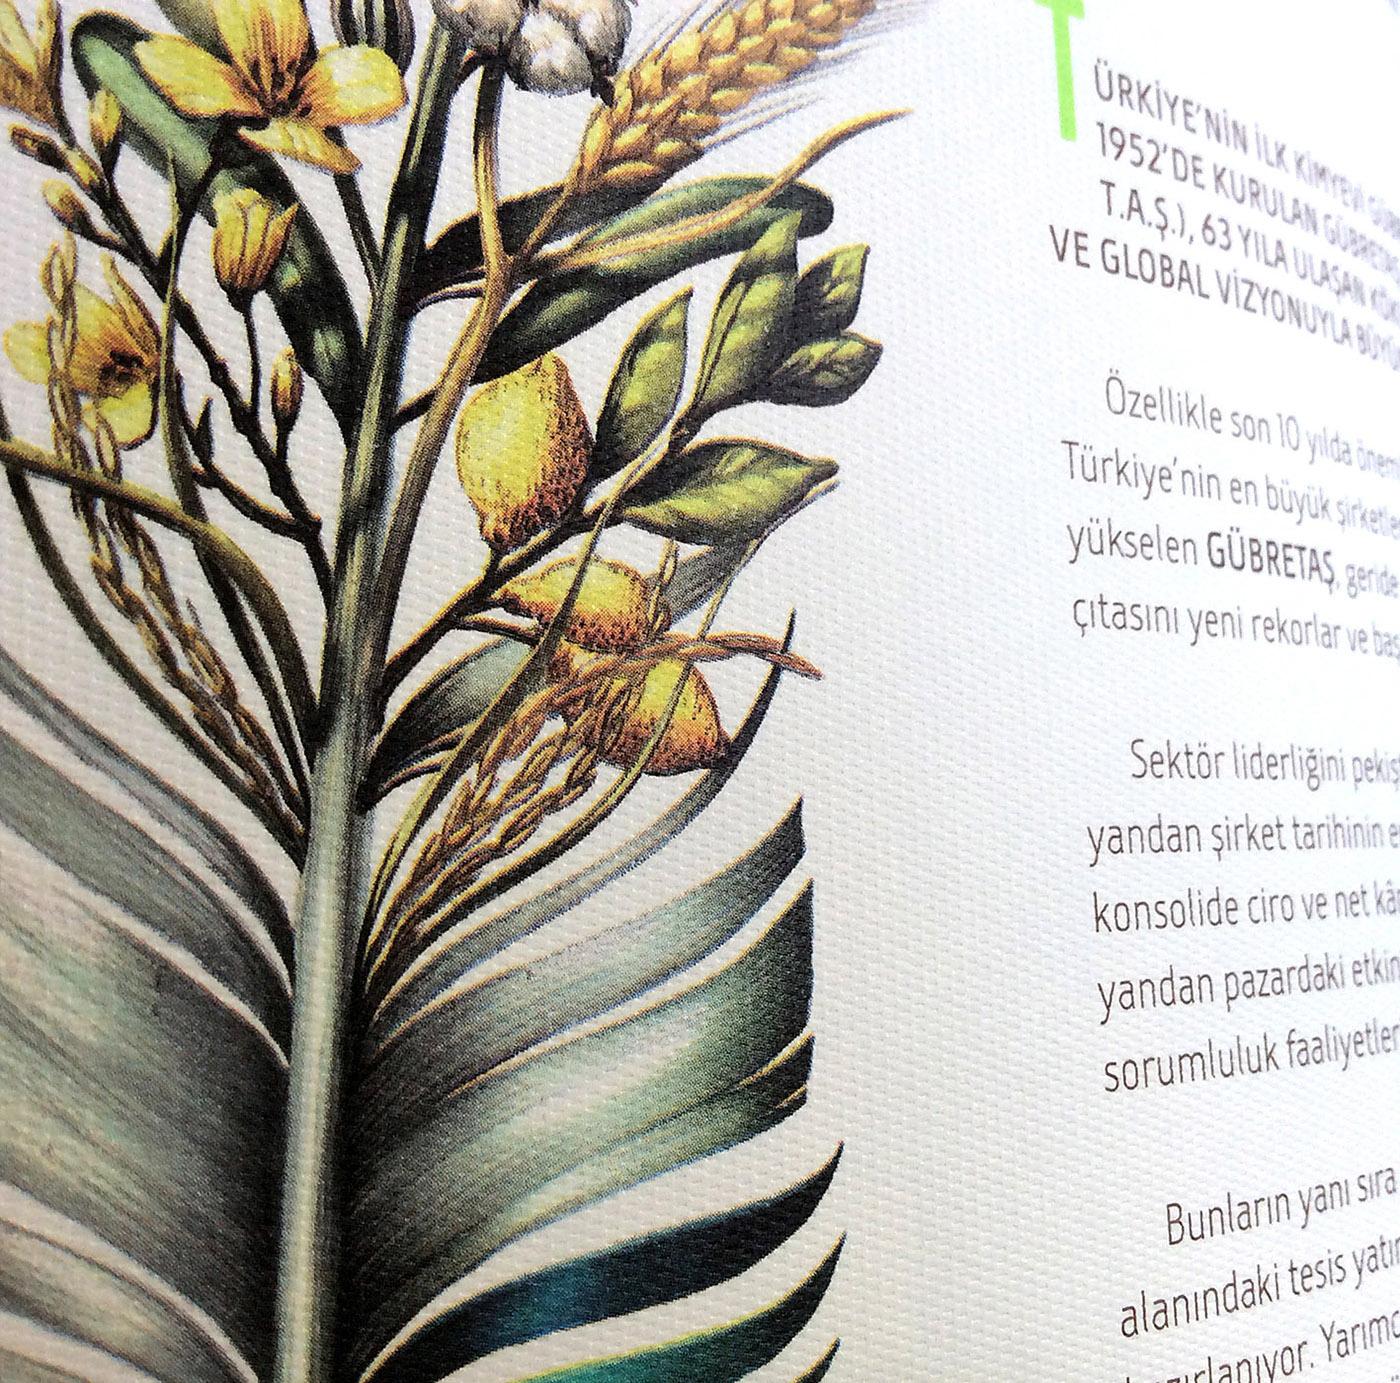 fertilizing Turkey soil seeds ANNUAL report memoria corporativa fetilizing istanbul agriculture faaliyet raporu Gübretas Graffiti Studio